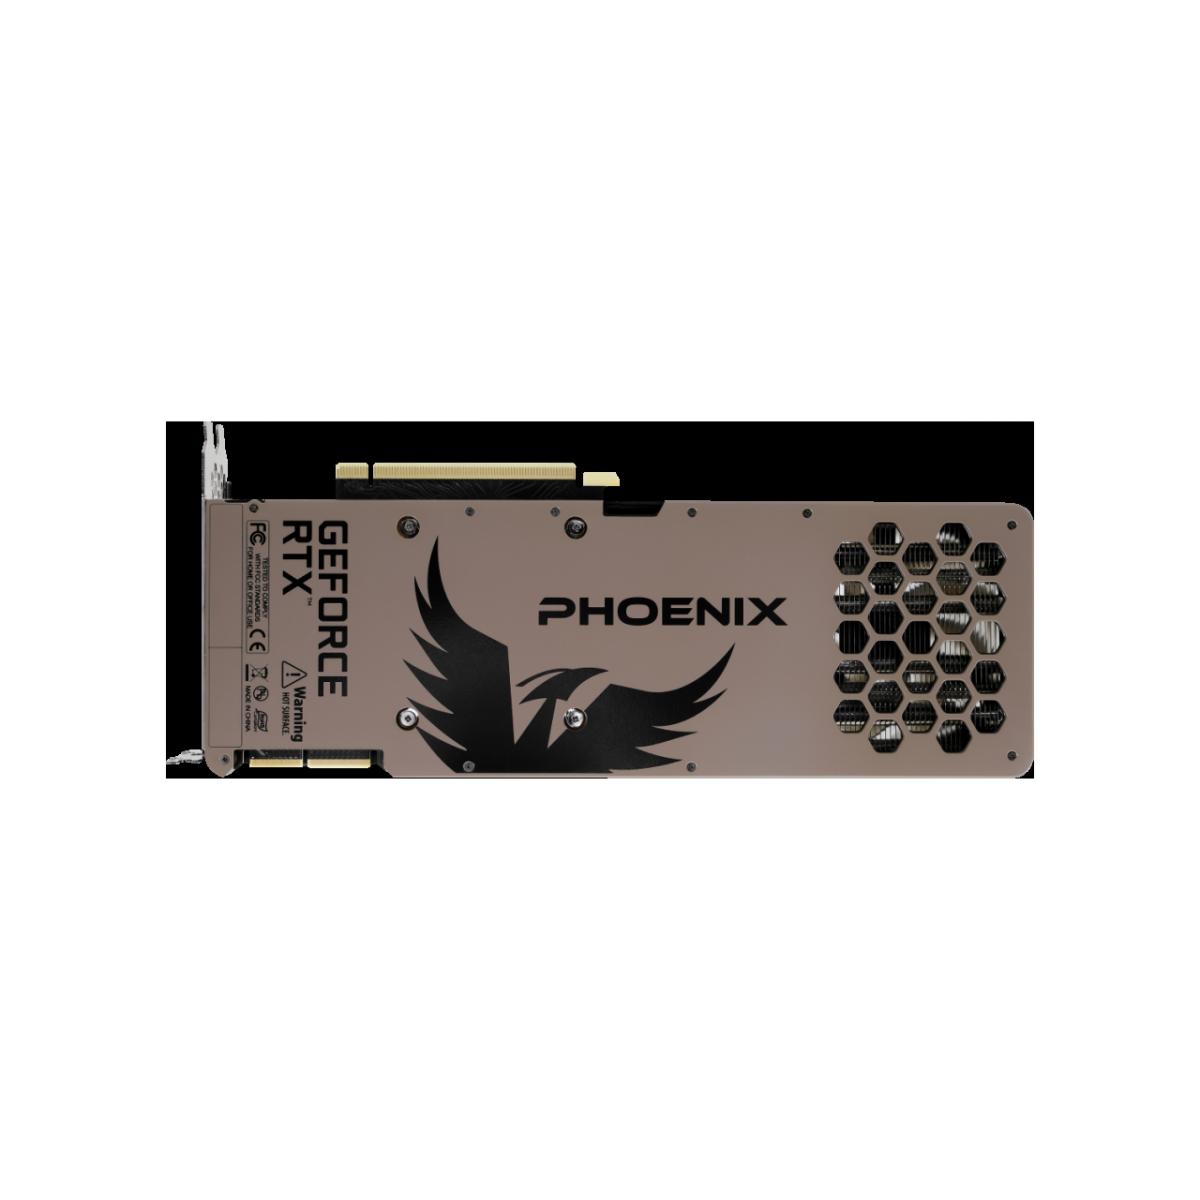 Placa de Vídeo Gainward, GeForce RTX 3080 Phoenix GS, 10GB, GDDR6, 320Bit, NED3080S19IA-132AX